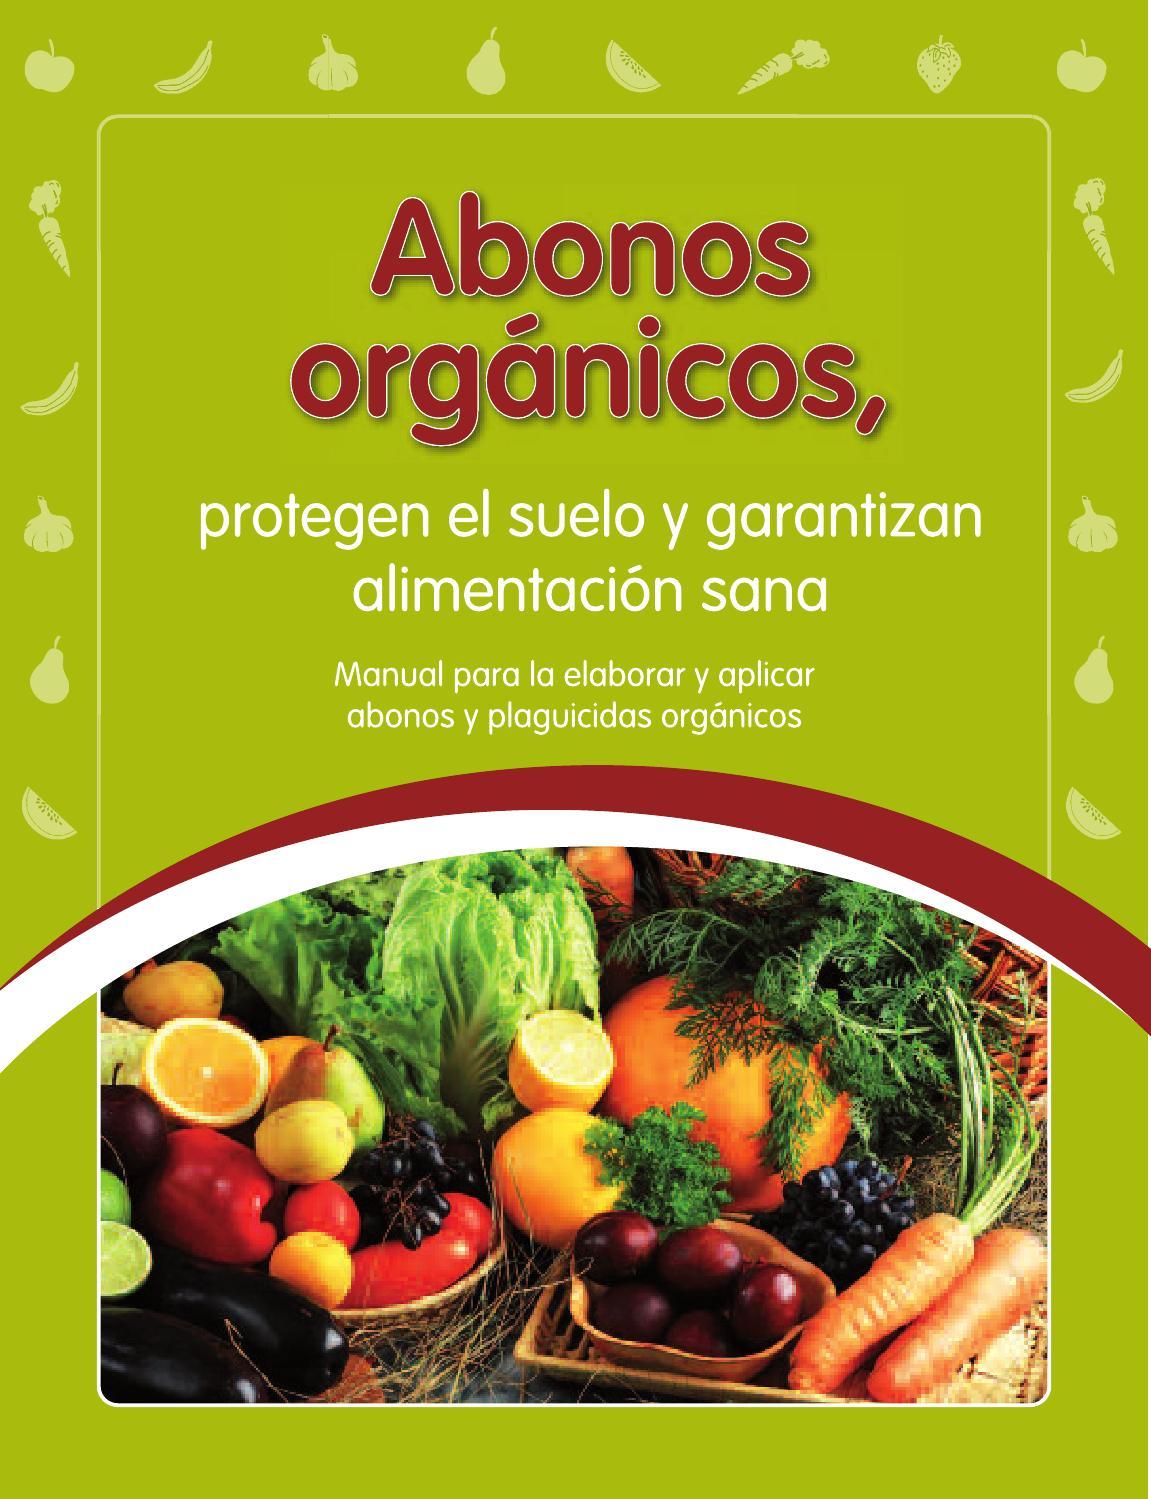 Abonos organicos by Monica Granja - issuu